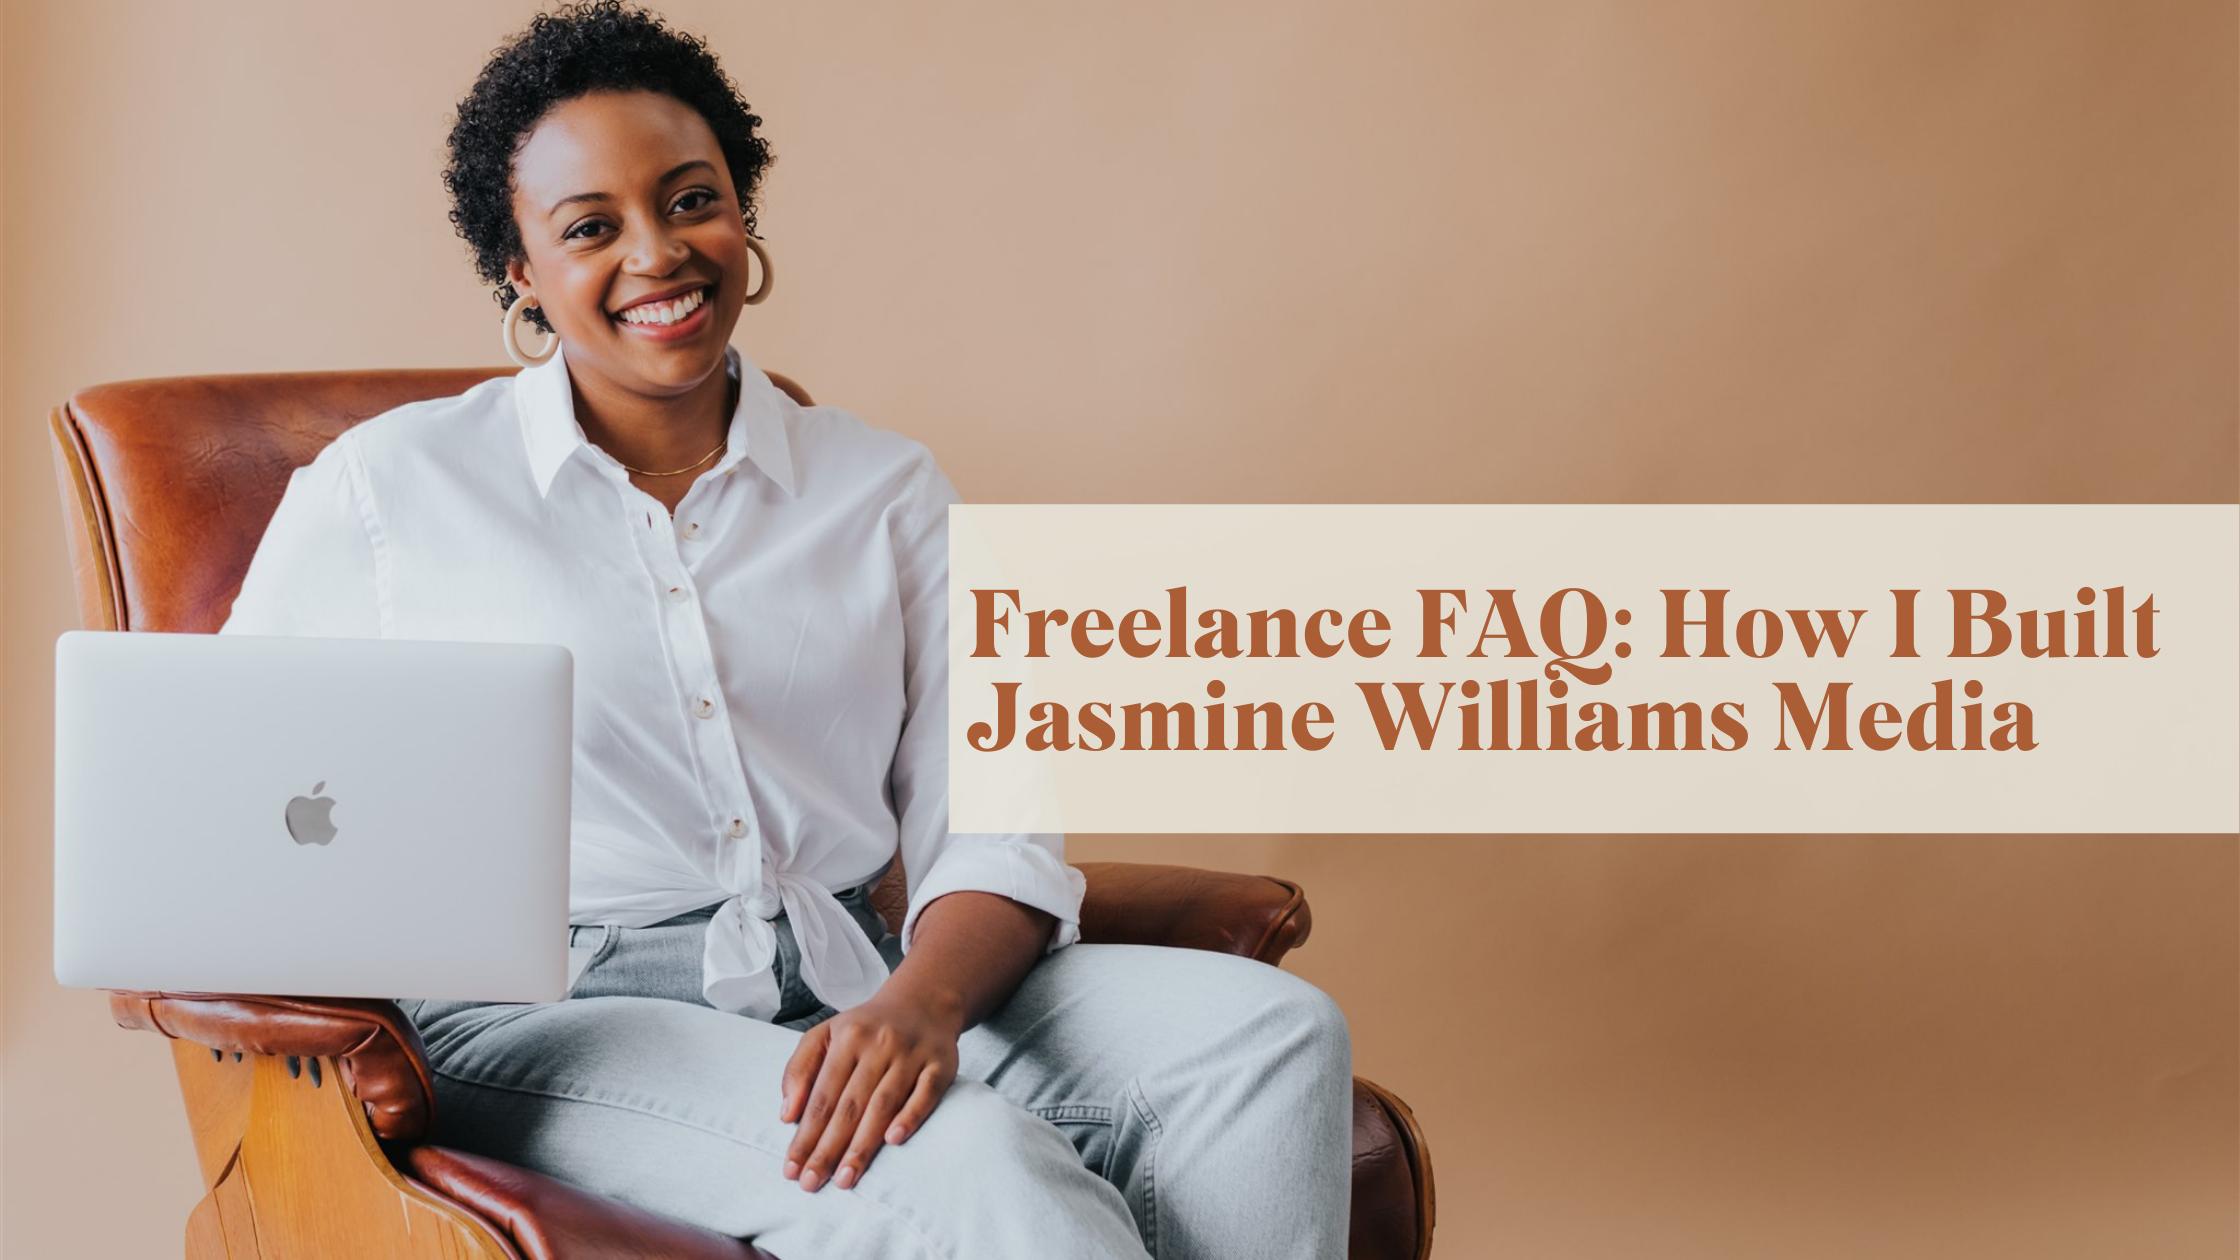 Freelance FAQ: How I Built Jasmine Williams Media